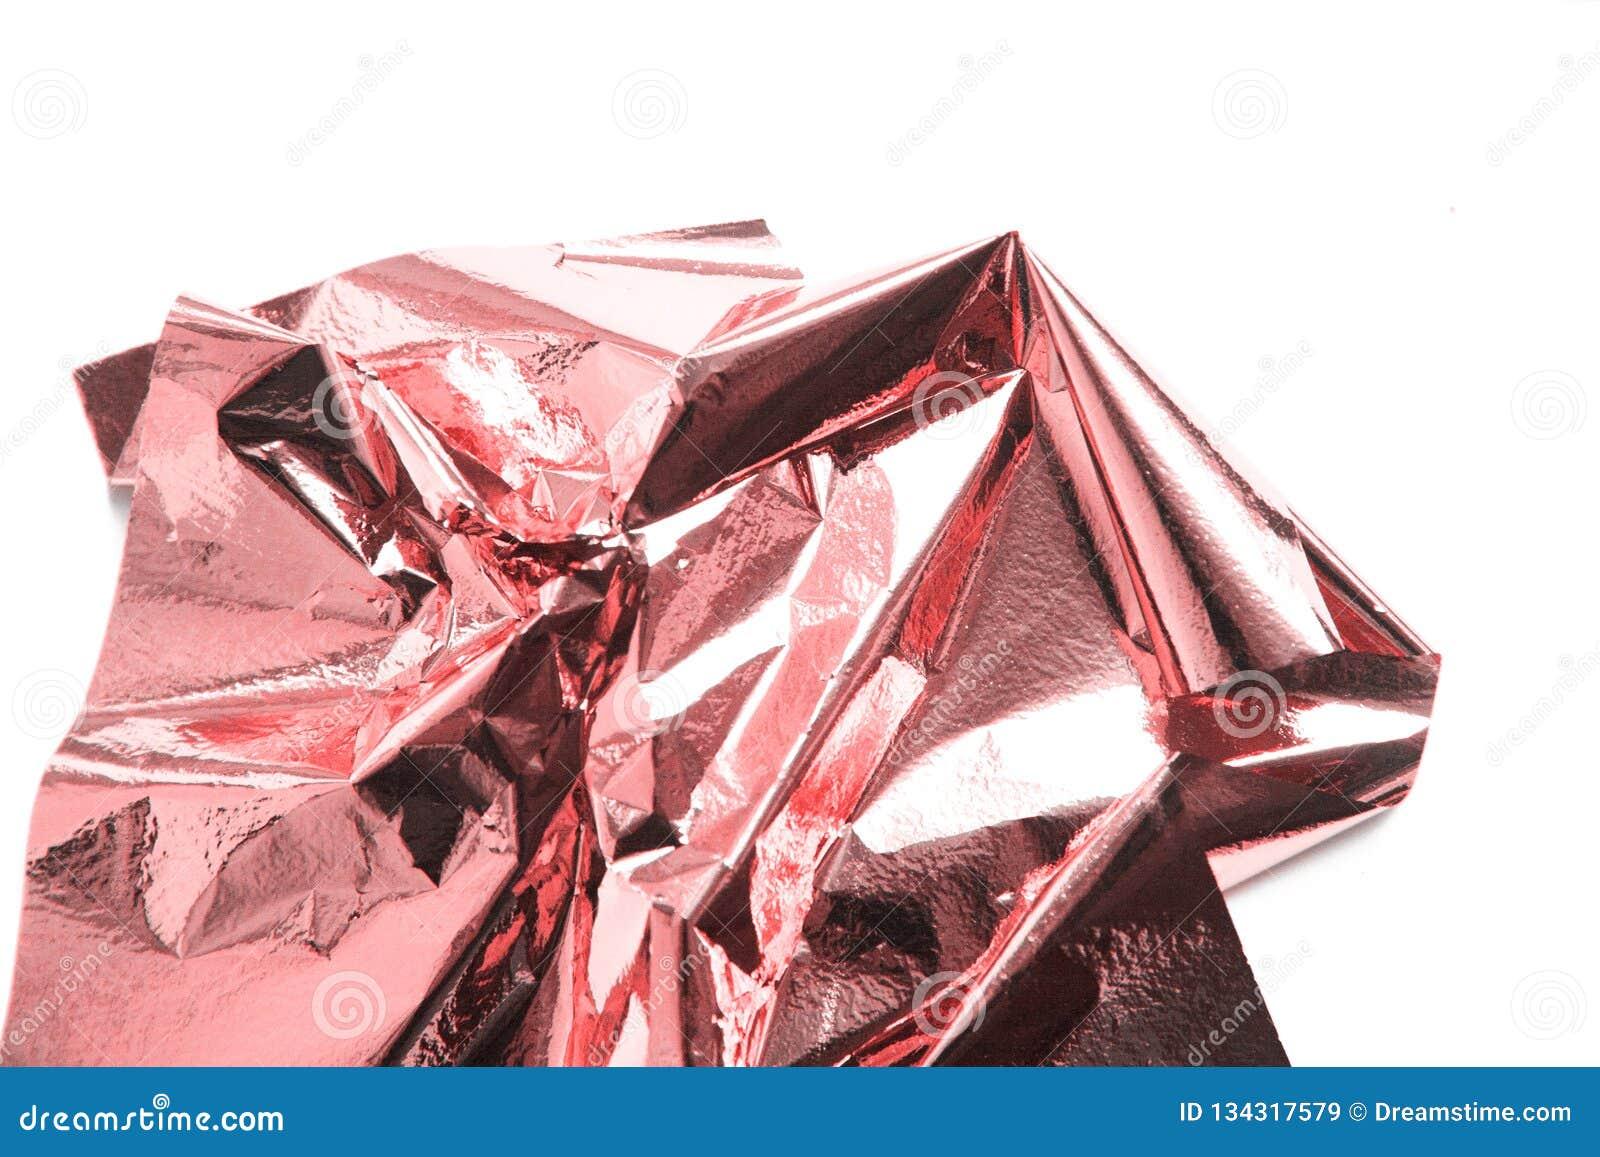 Living coral, metal shiny pink gold foil sheet